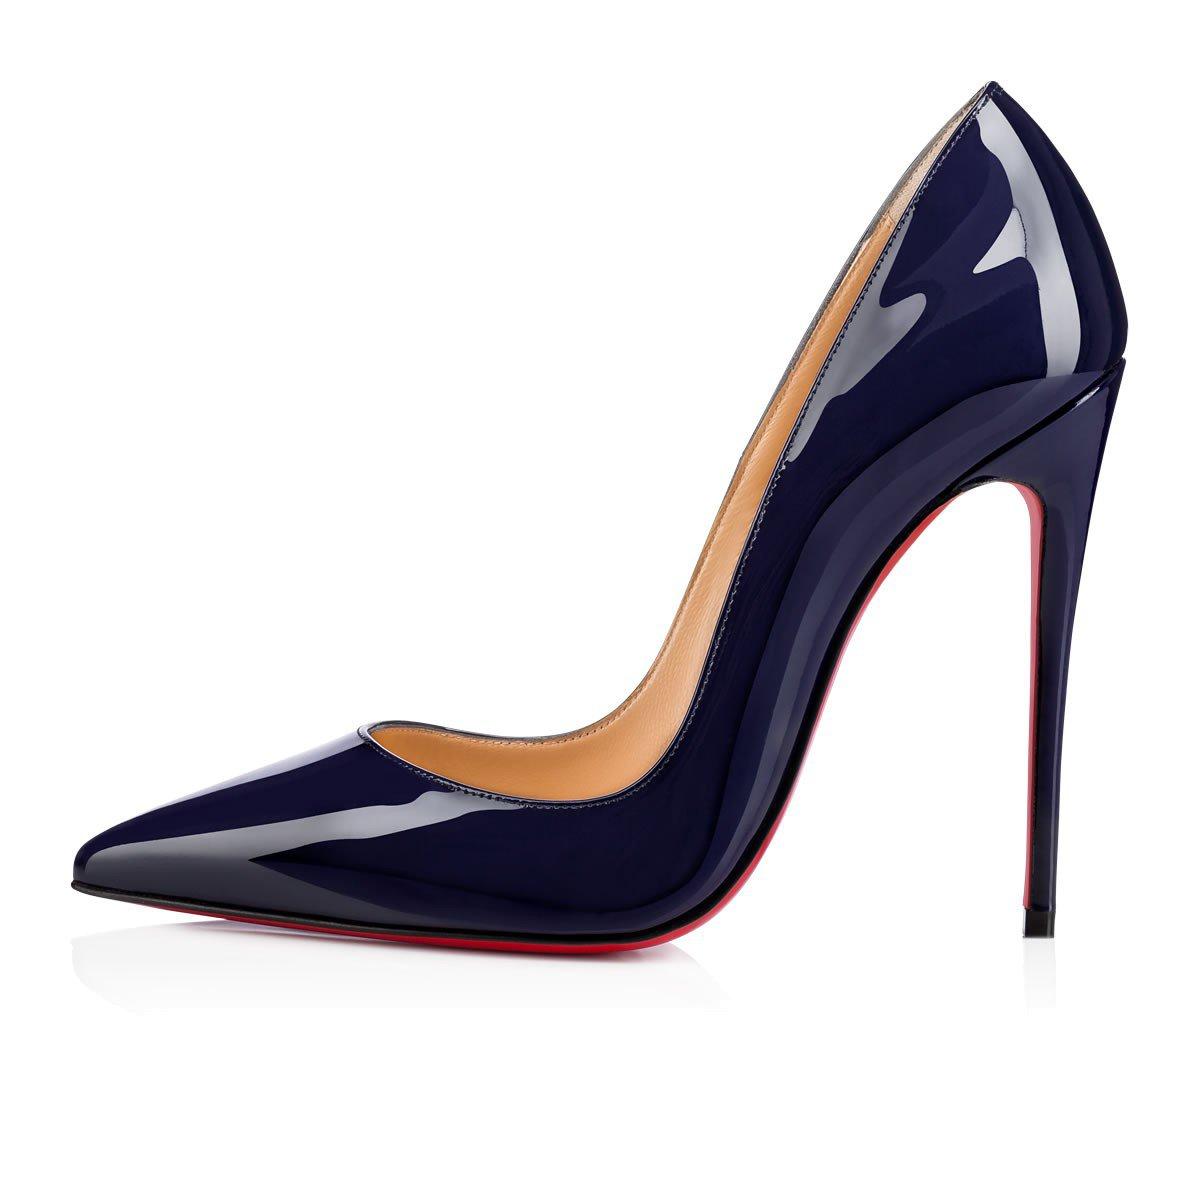 Christian Louboutin - So Kate 120 China Blue Patent Leather